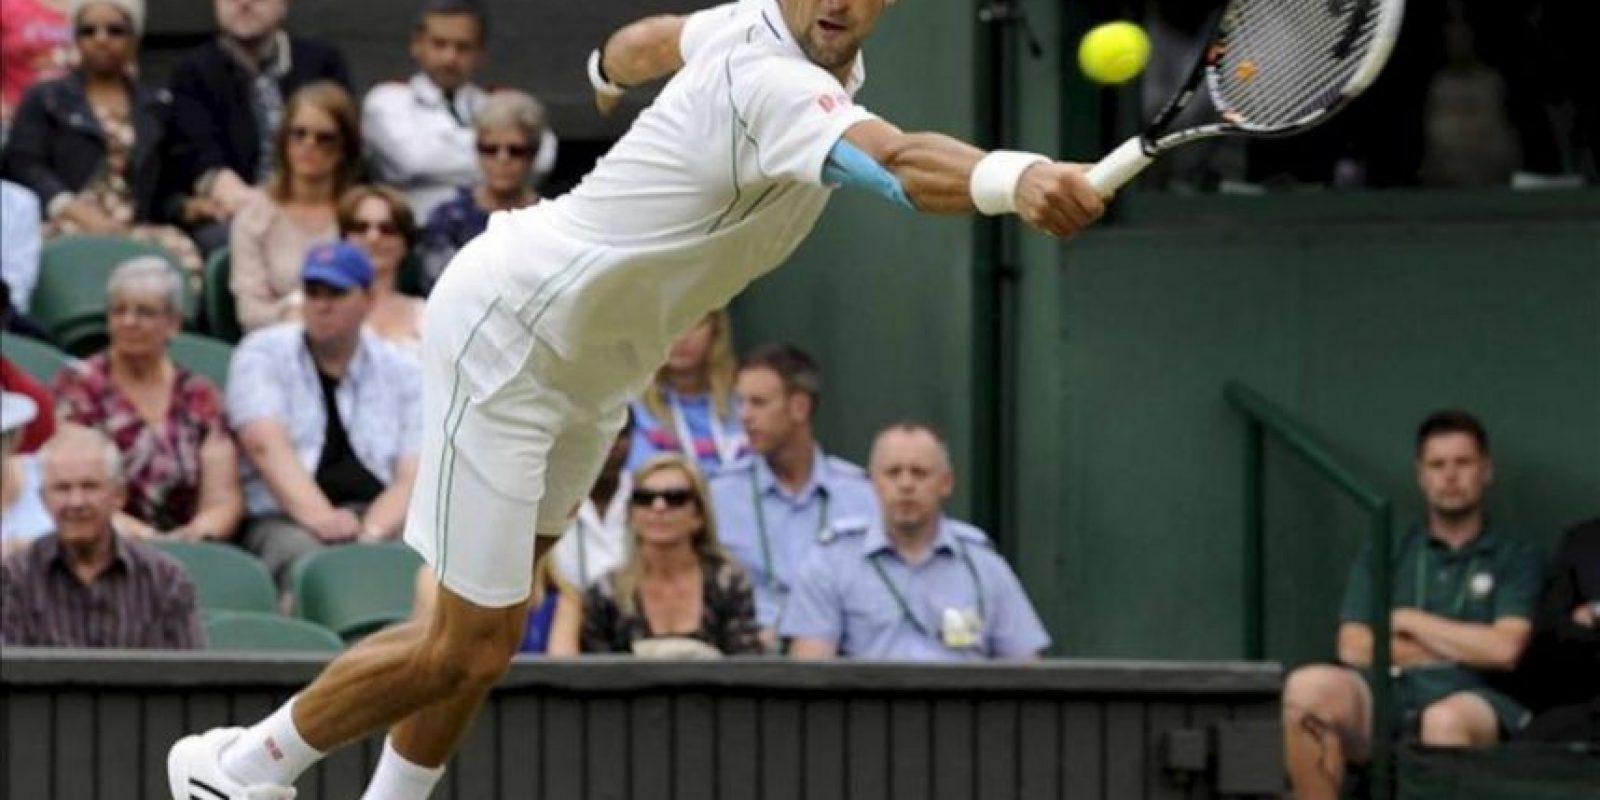 El tenista serbio Novak Djokovic devuelve la bola durante el partido de tercera ronda del torneo de Wimbledon que disputó contra el checo Radek Stepanek. EFE